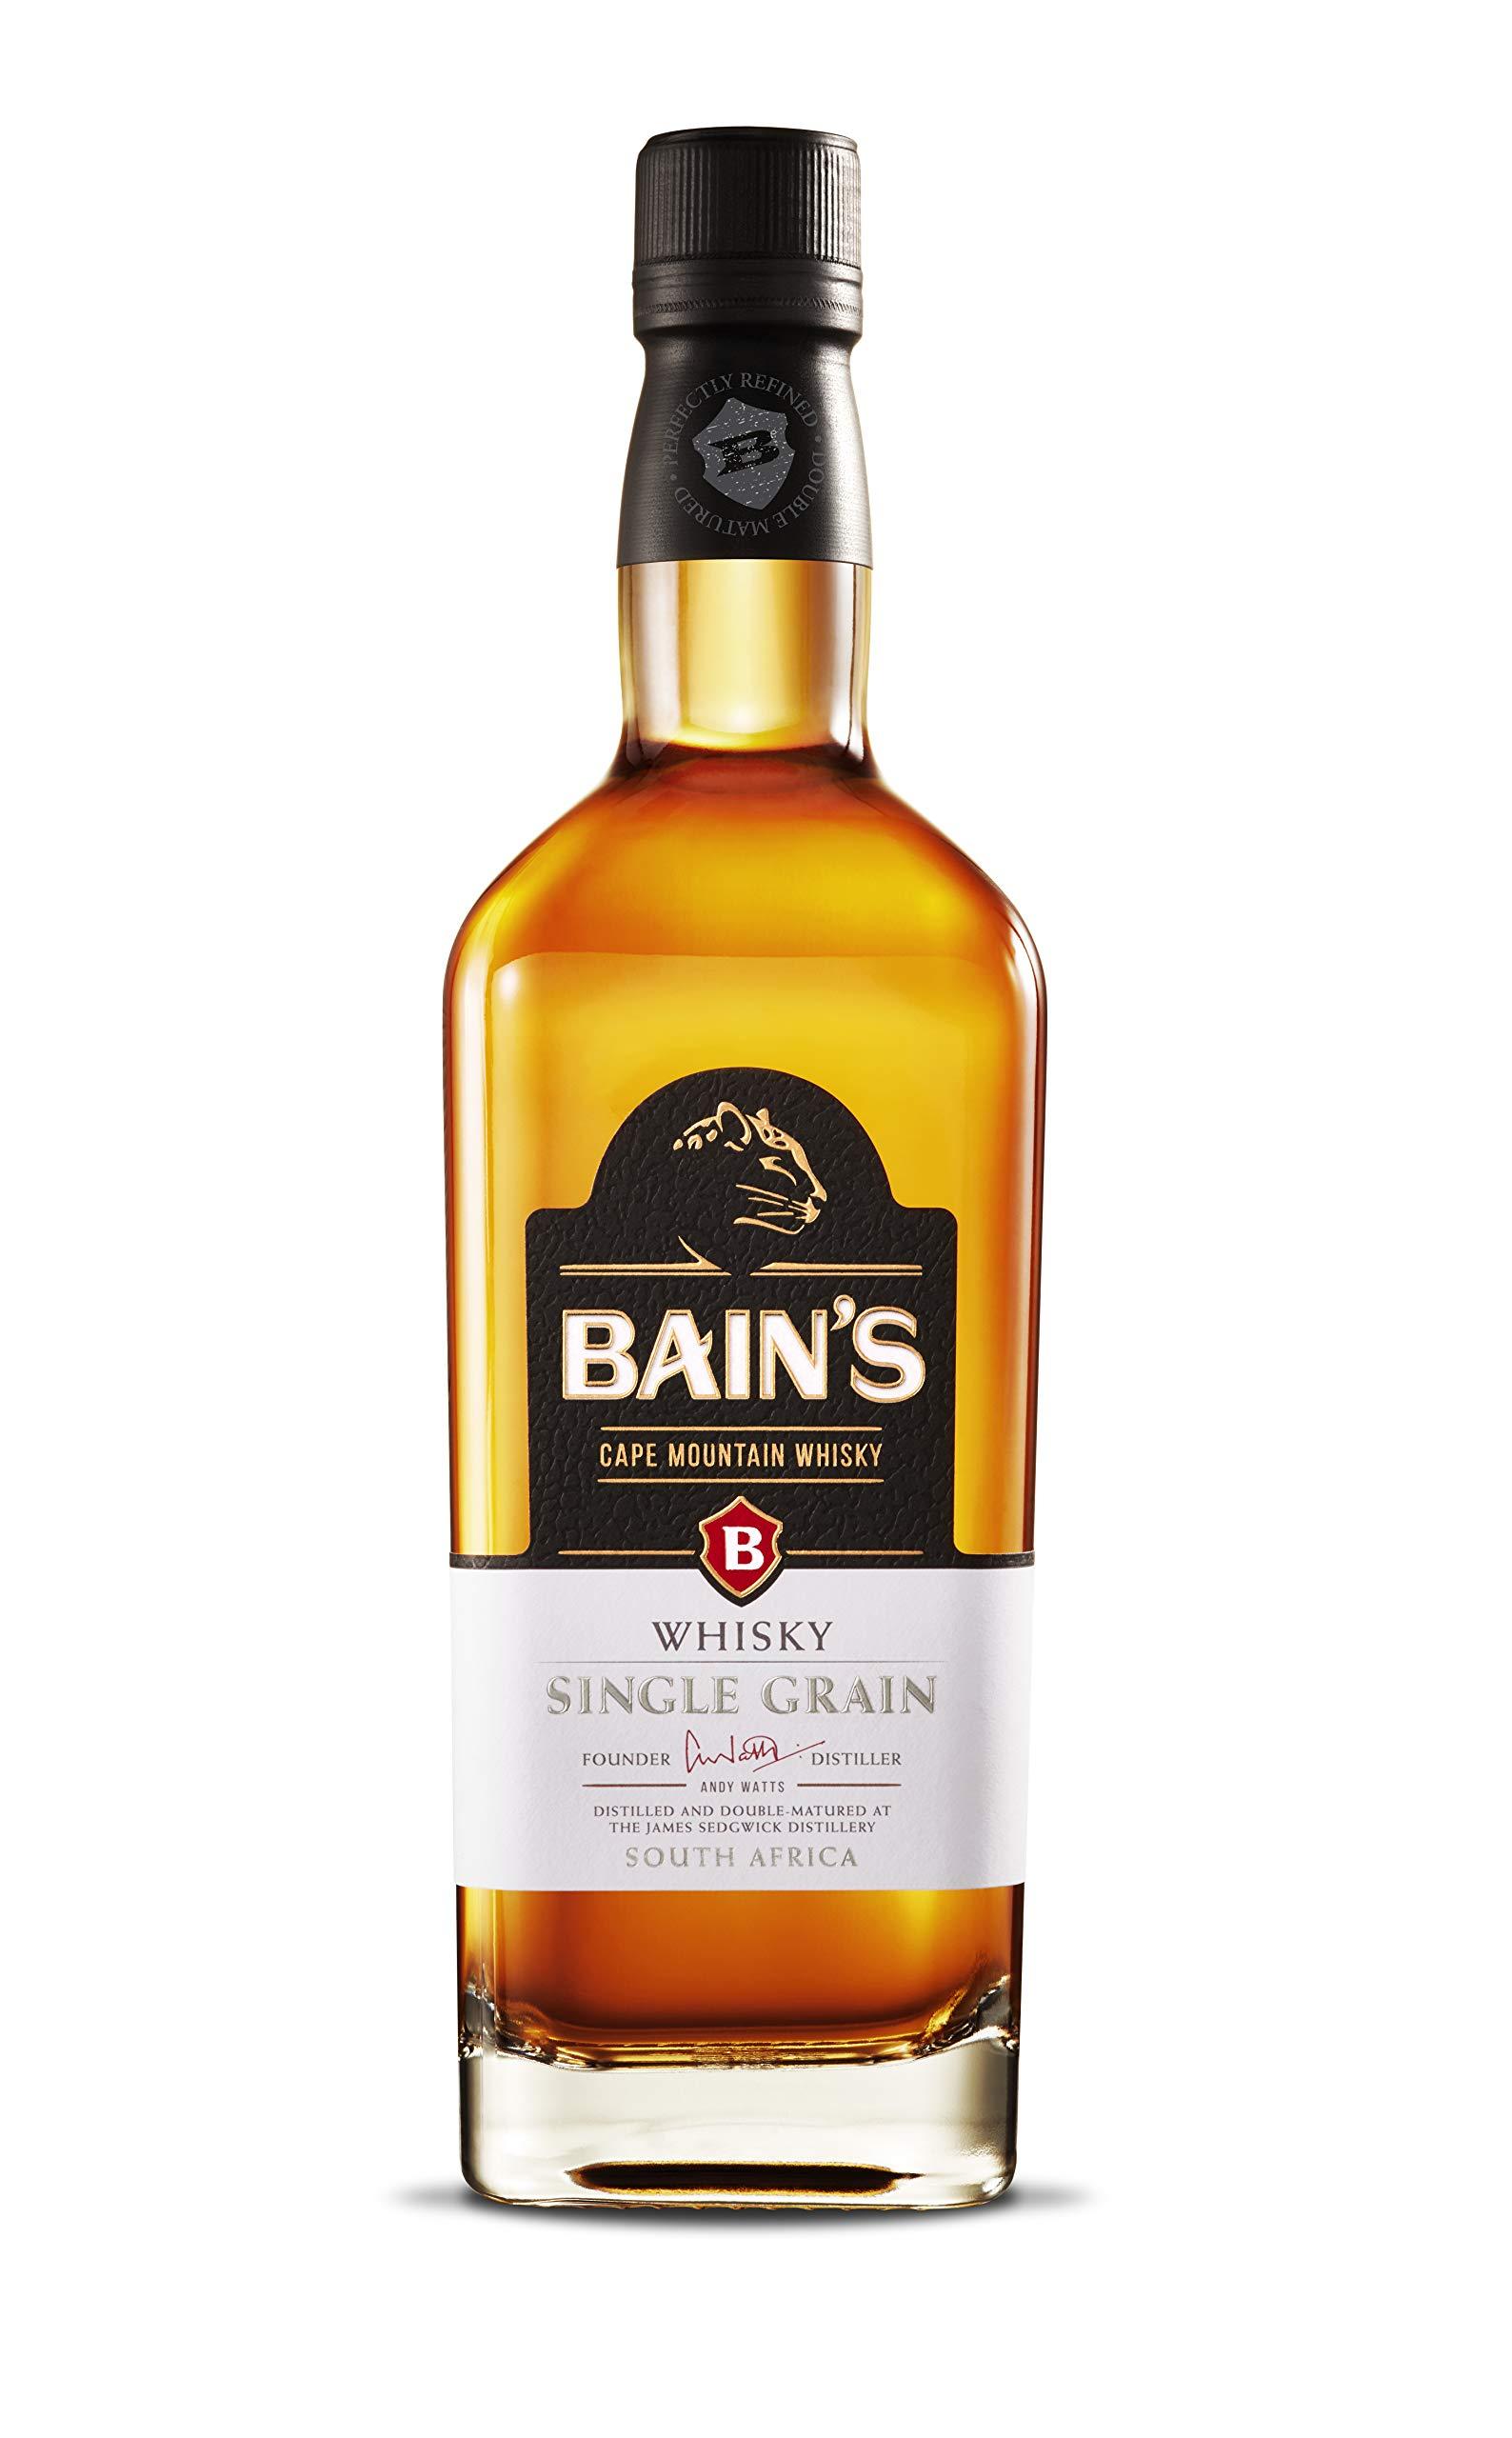 Bains-Sdafrikanischer-Single-Grain-Whisky-1-x-07-l